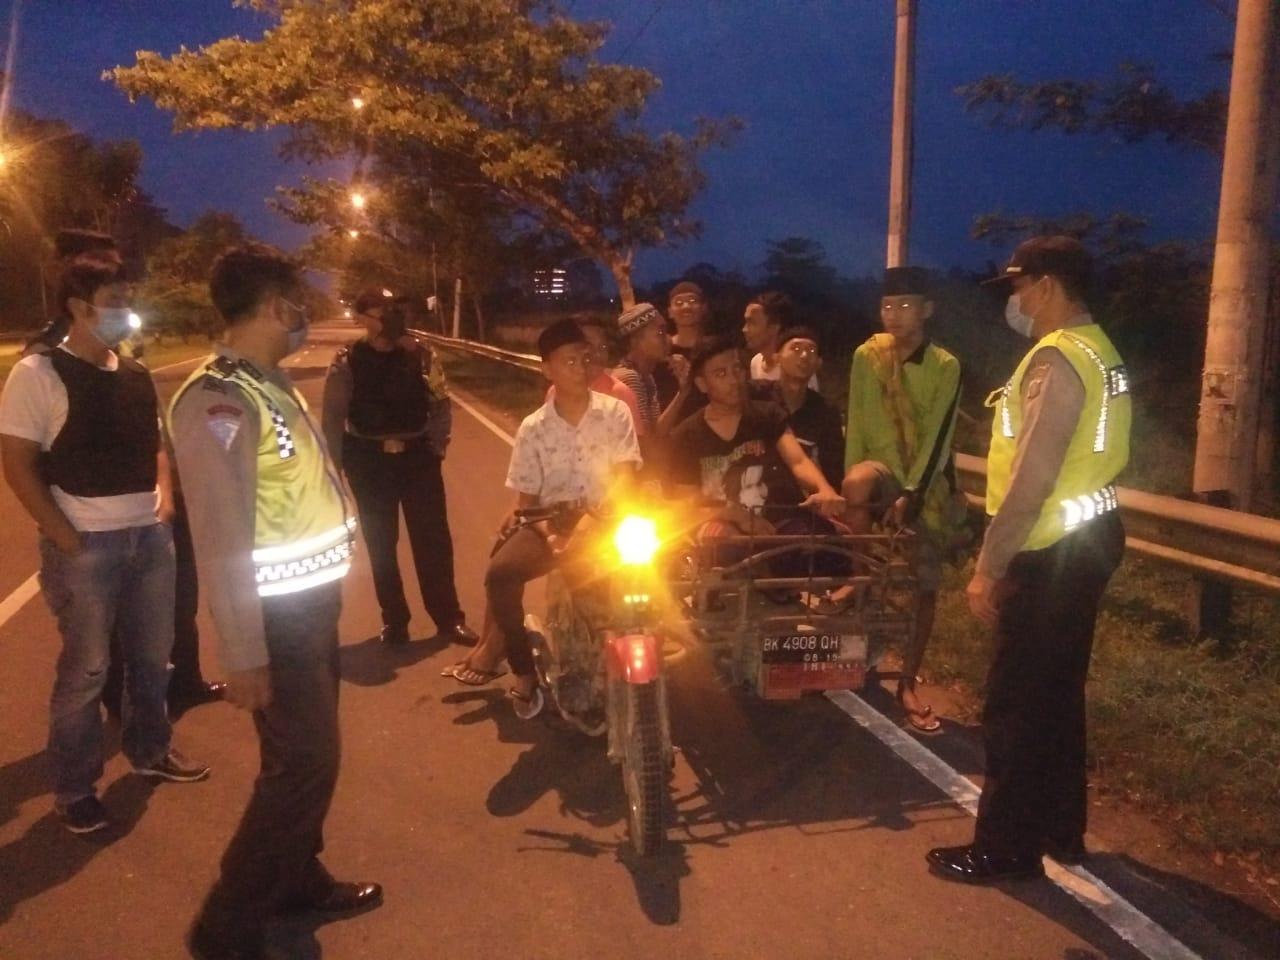 Polsek Batang Kuis, Giat Patroli Cegah Corona di Asmara Subuh